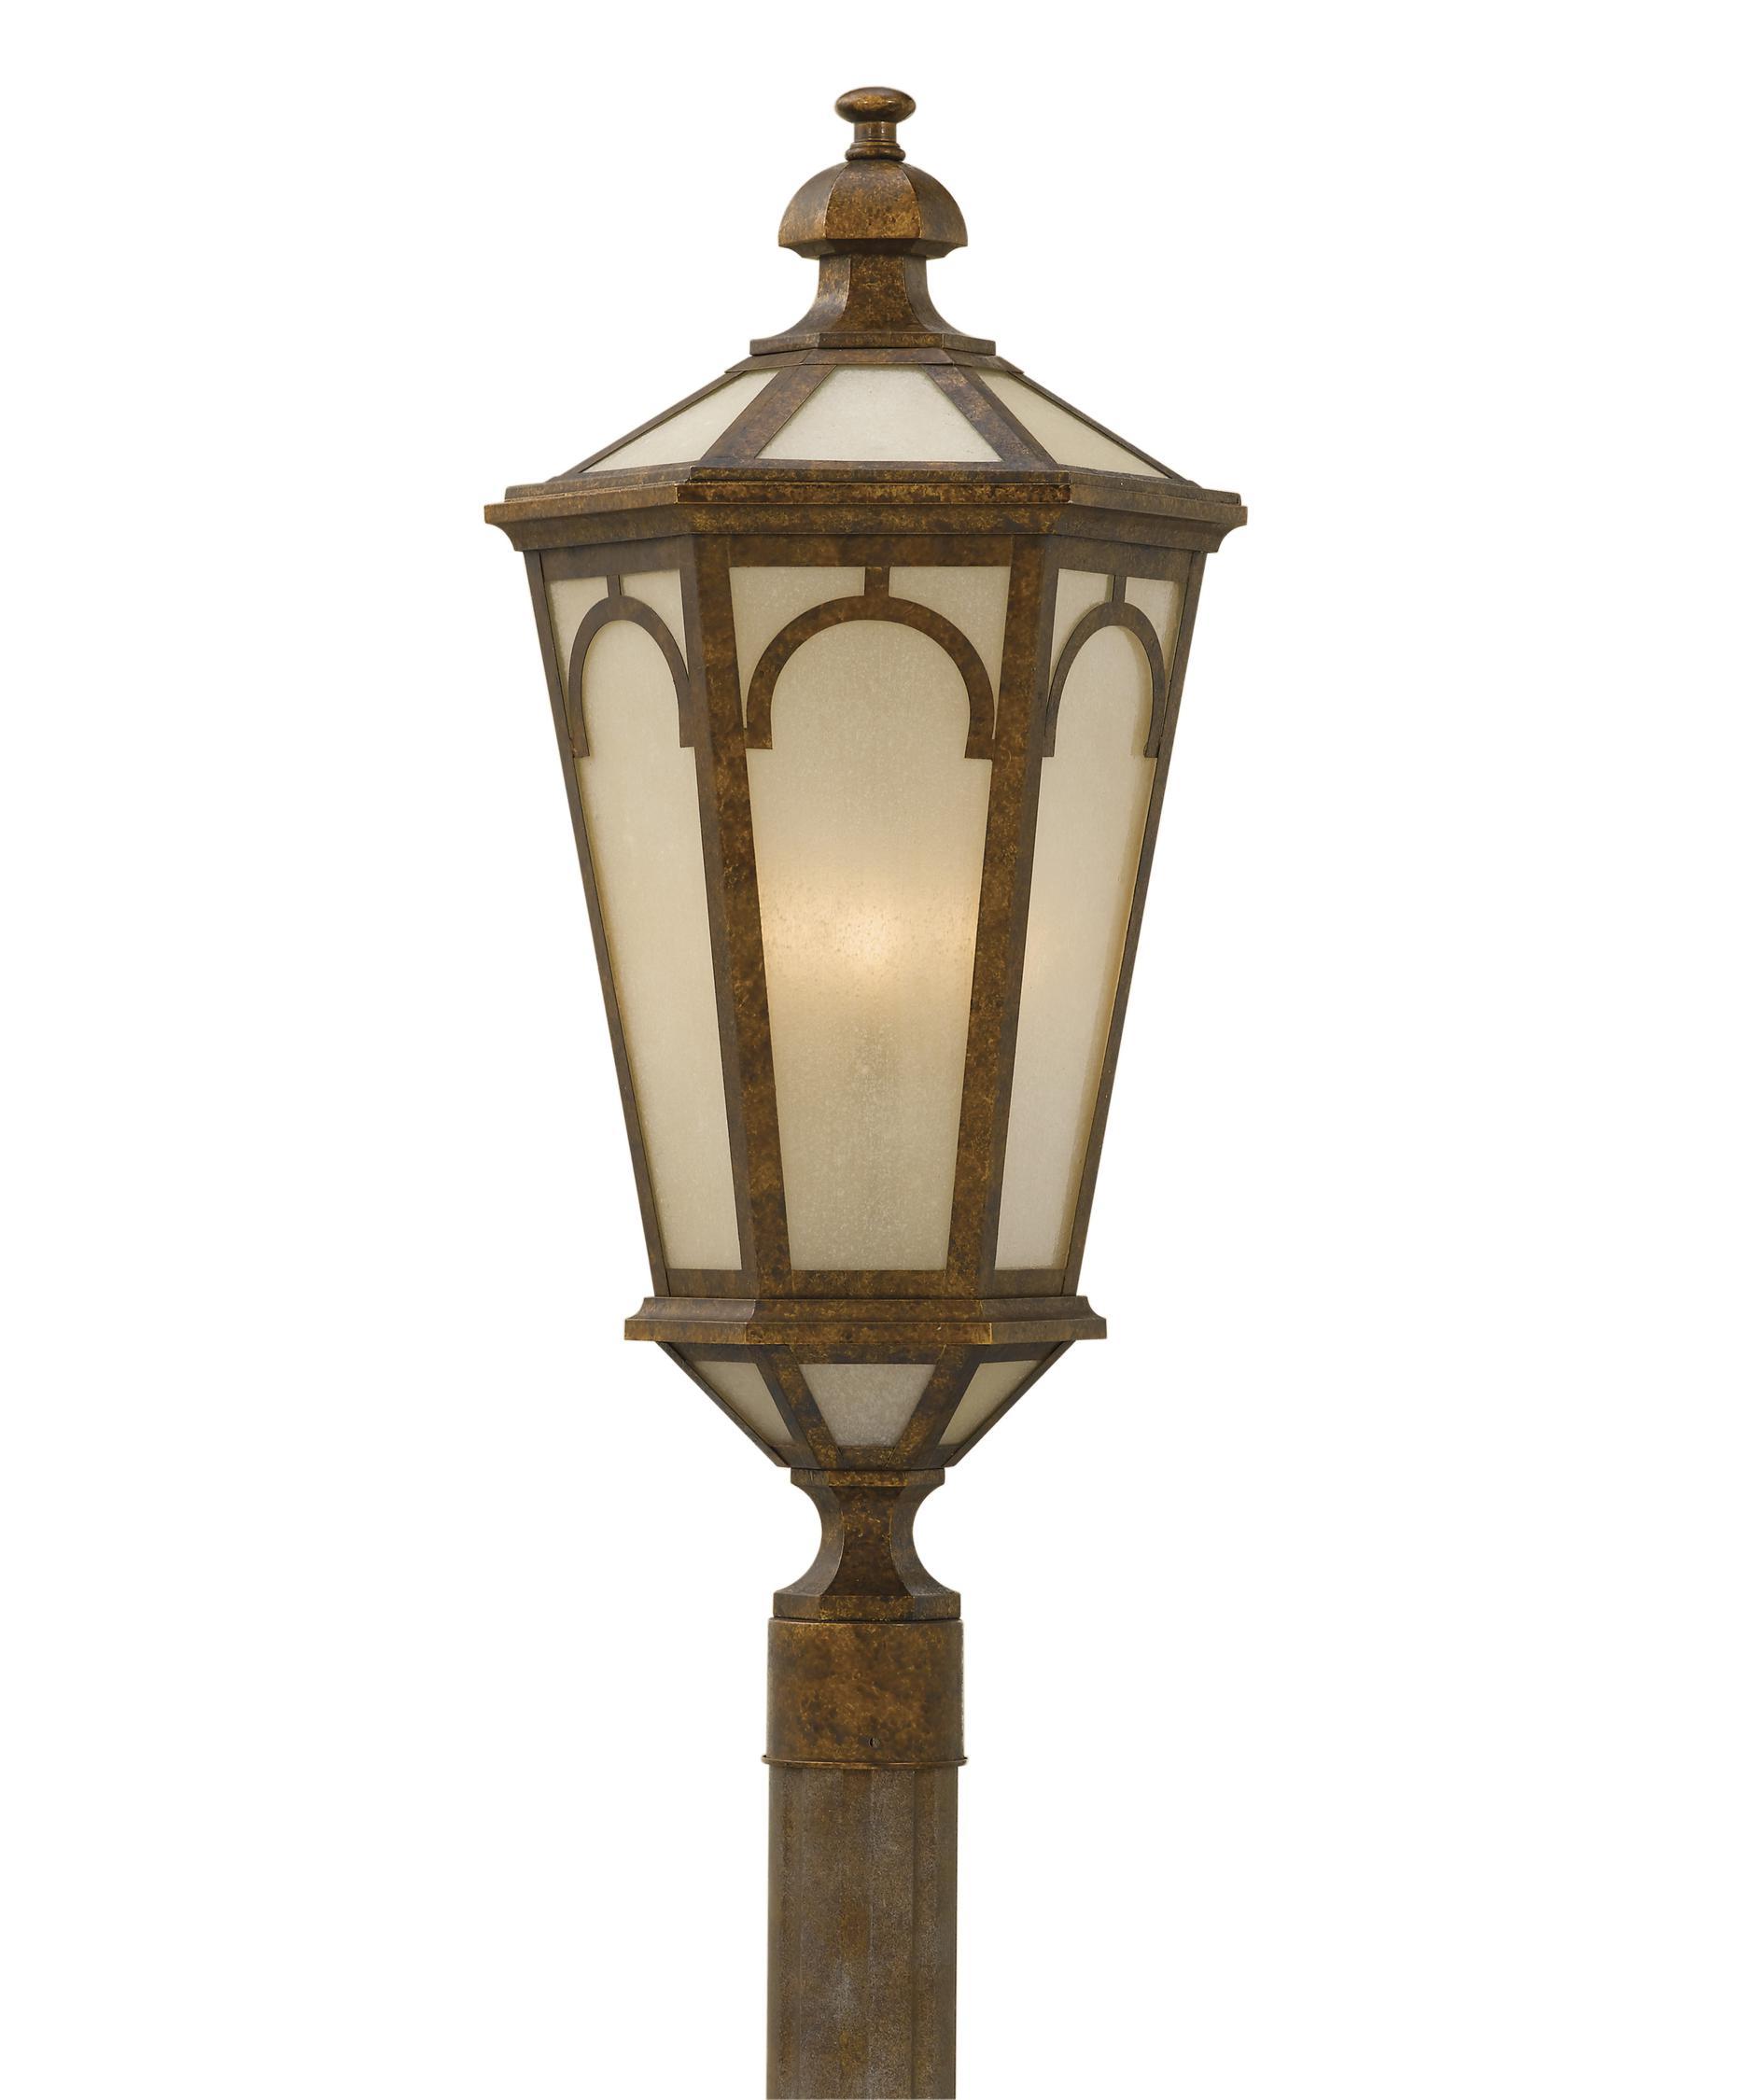 Murray Feiss Outdoor Lighting: Murray Feiss OL6408 Bond Street 4 Light Outdoor Post Lamp